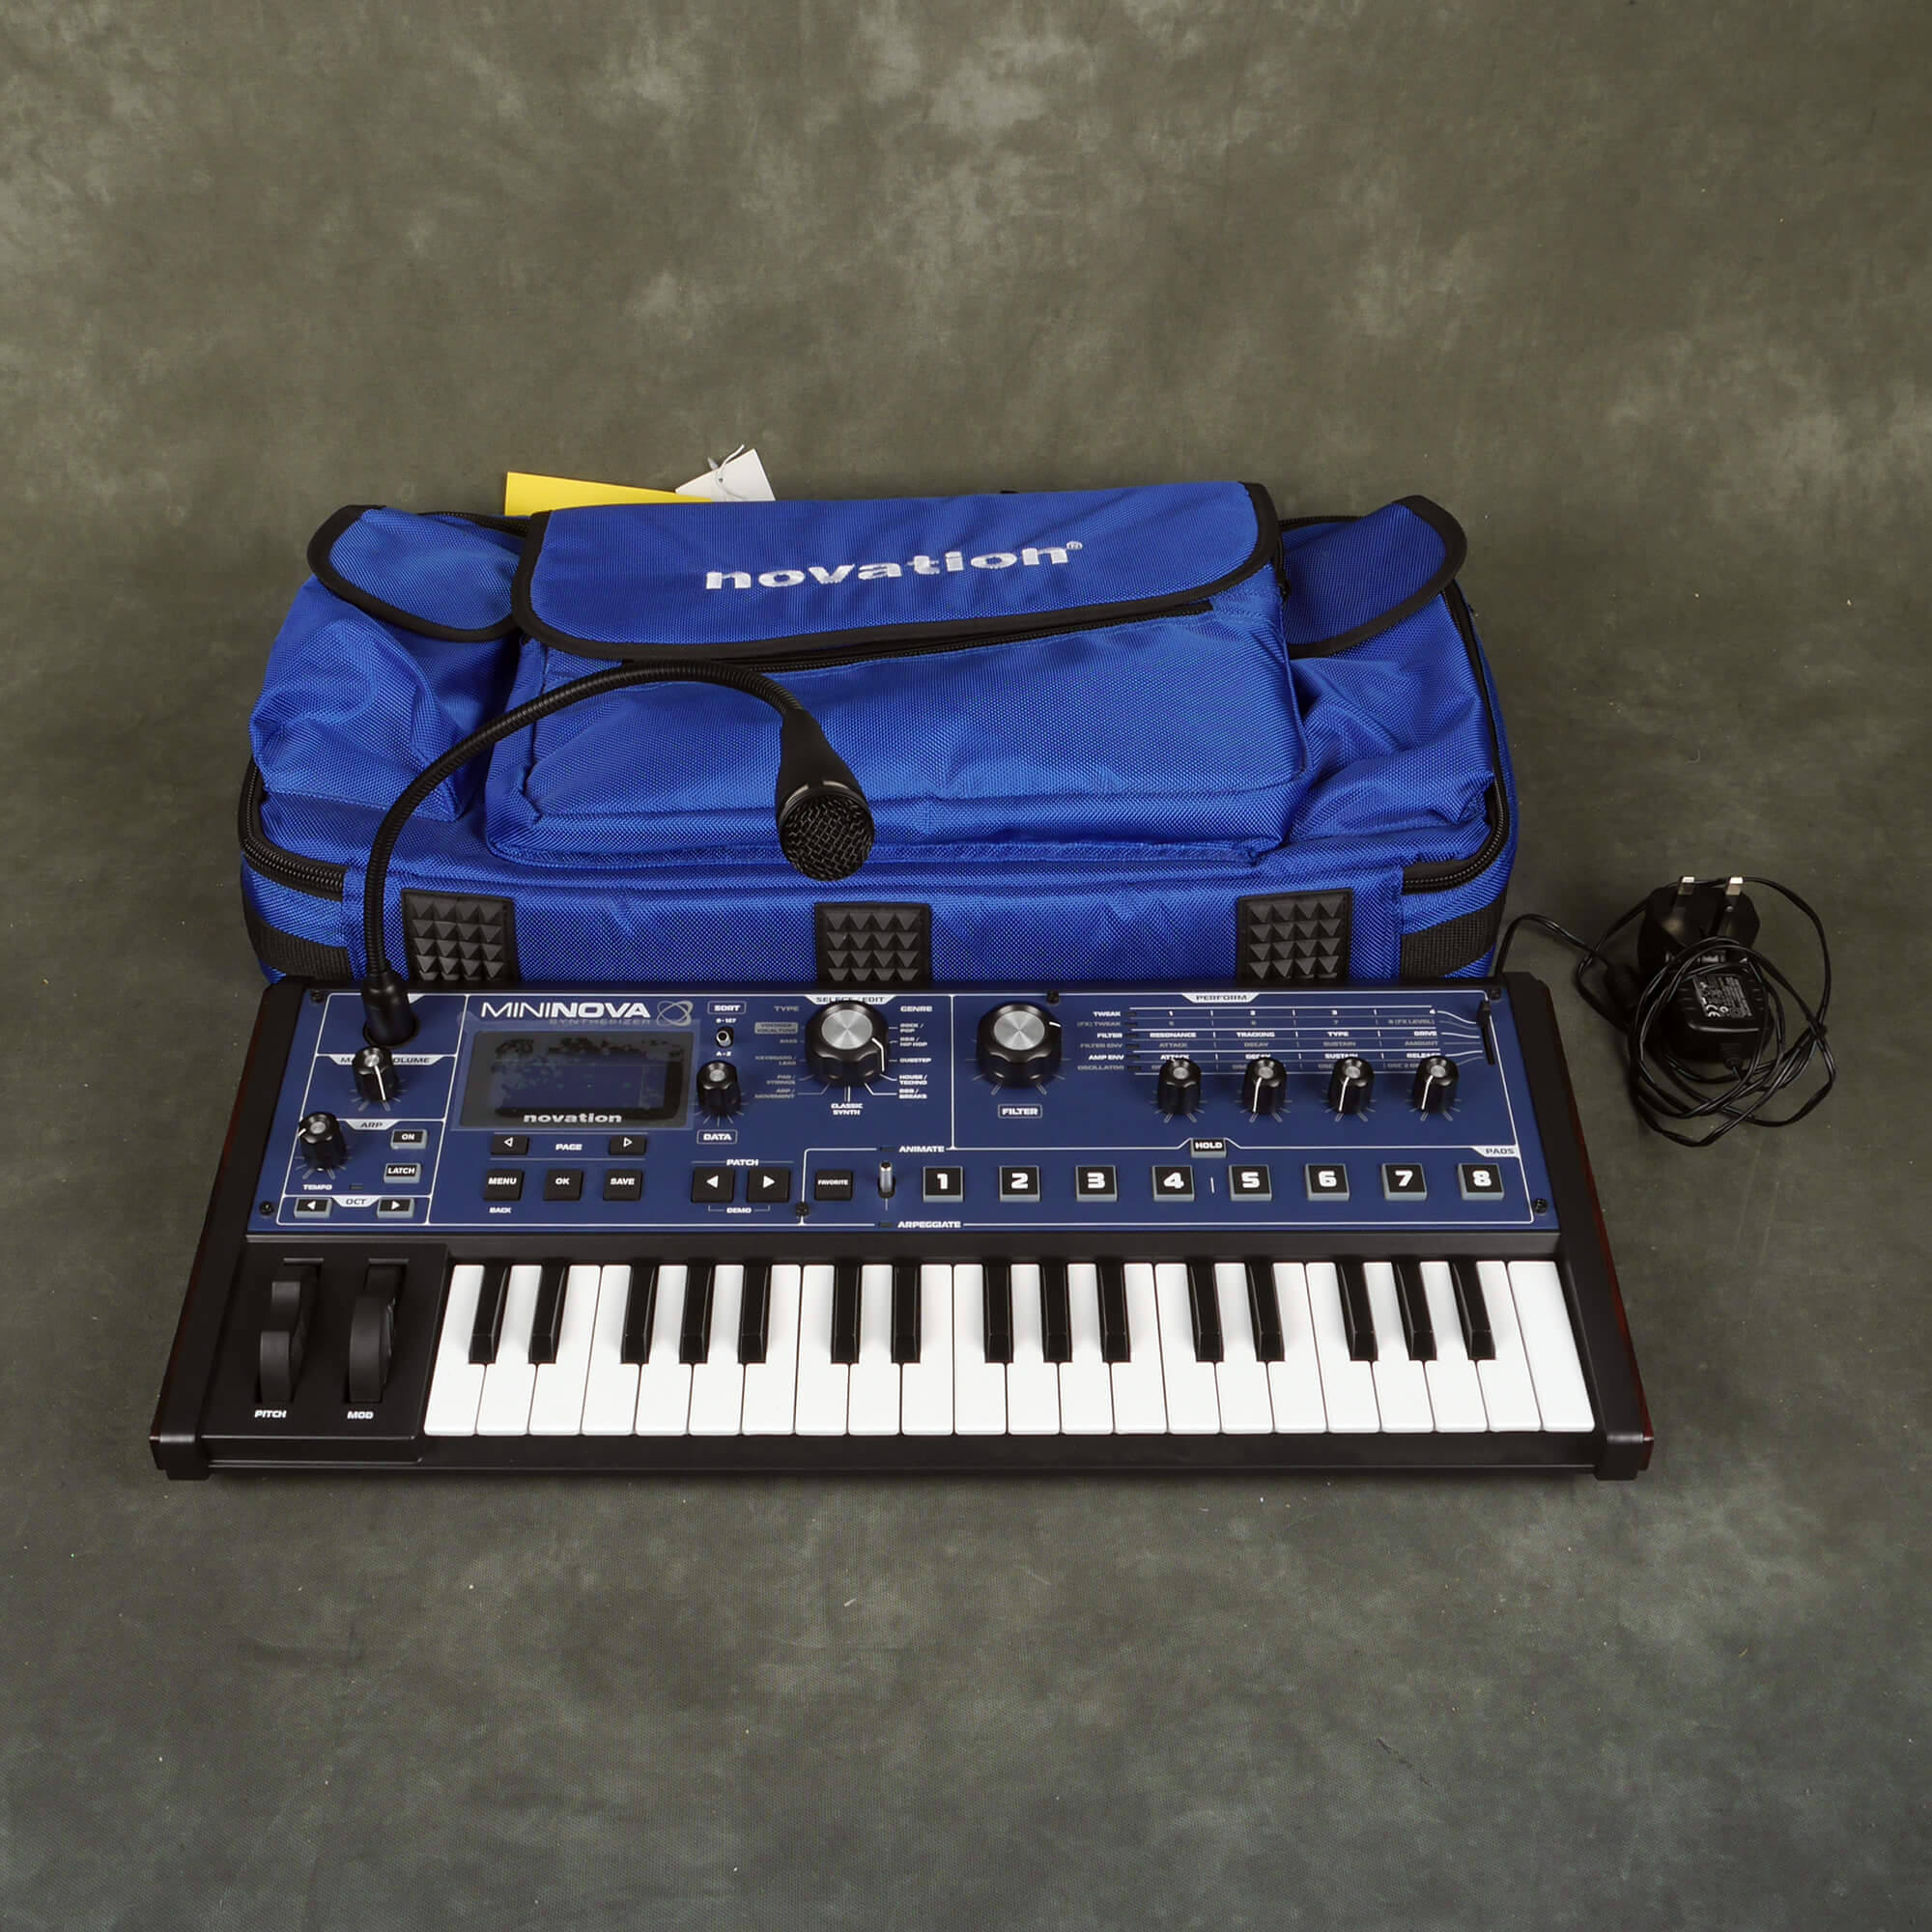 Novation MiniNova Keyboard Synthesizer w/Gig Bag - 2nd Hand